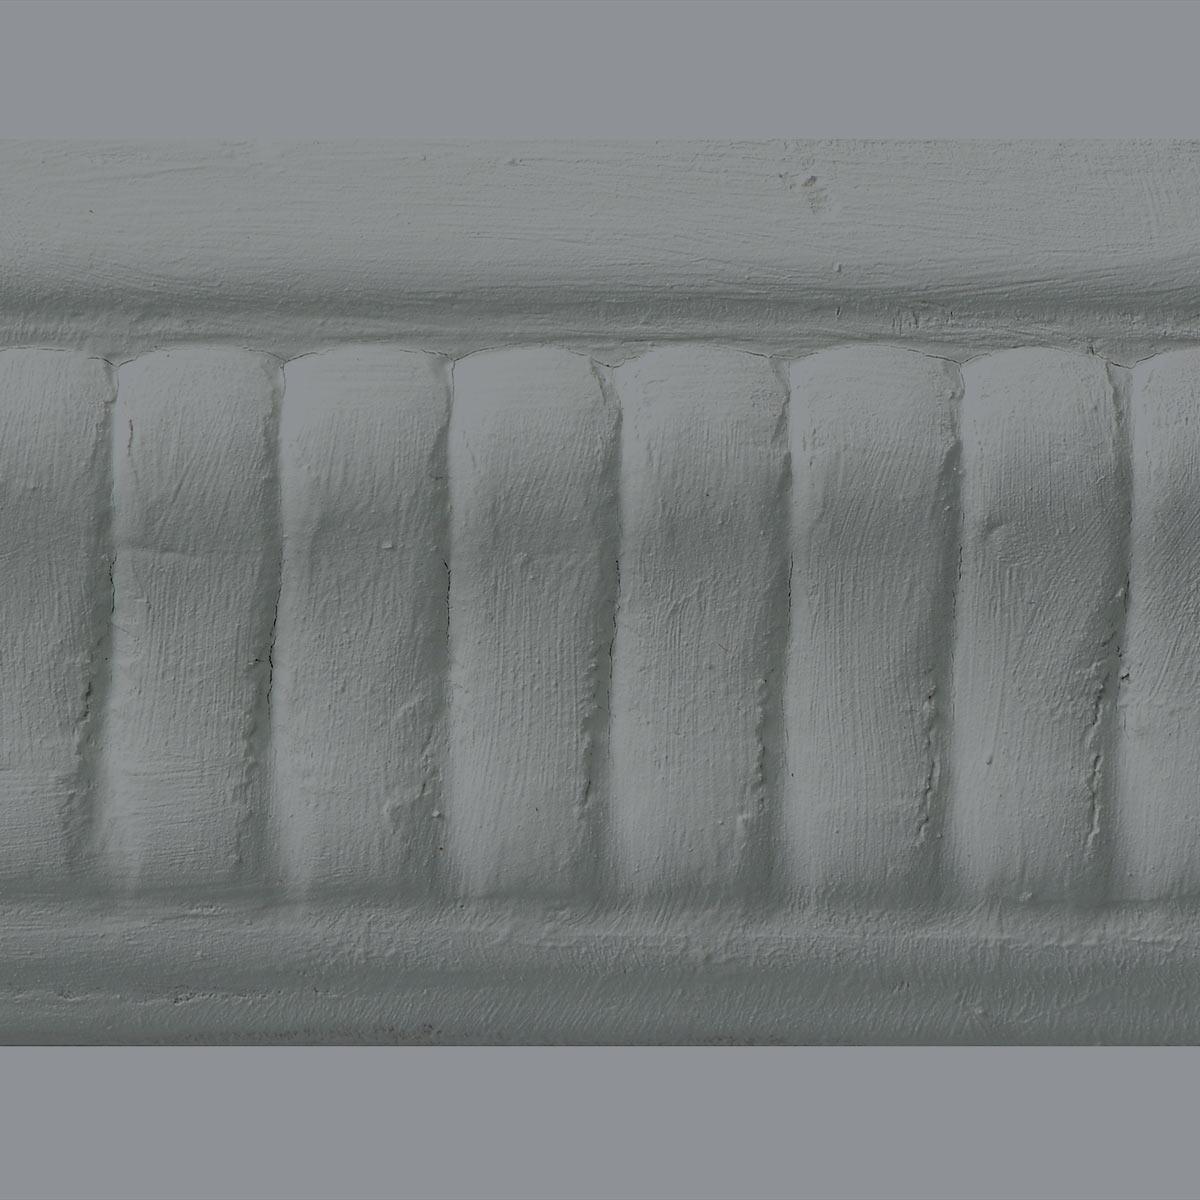 Waverly ® Inspirations Chalk Finish Acrylic Paint - Steel, 2 oz. - 44633E